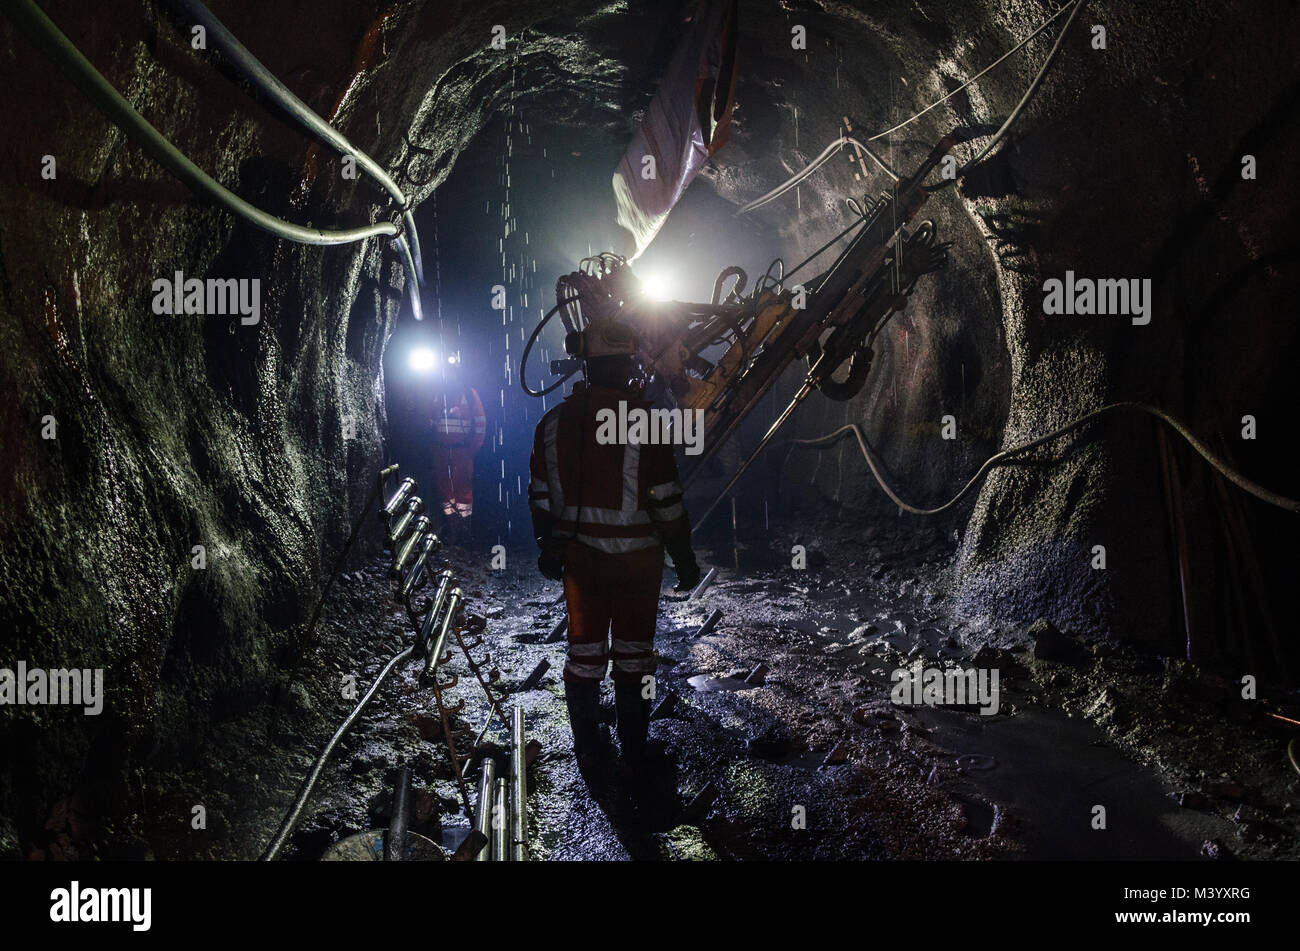 Mecánico de máquinas para minería Imagen De Stock